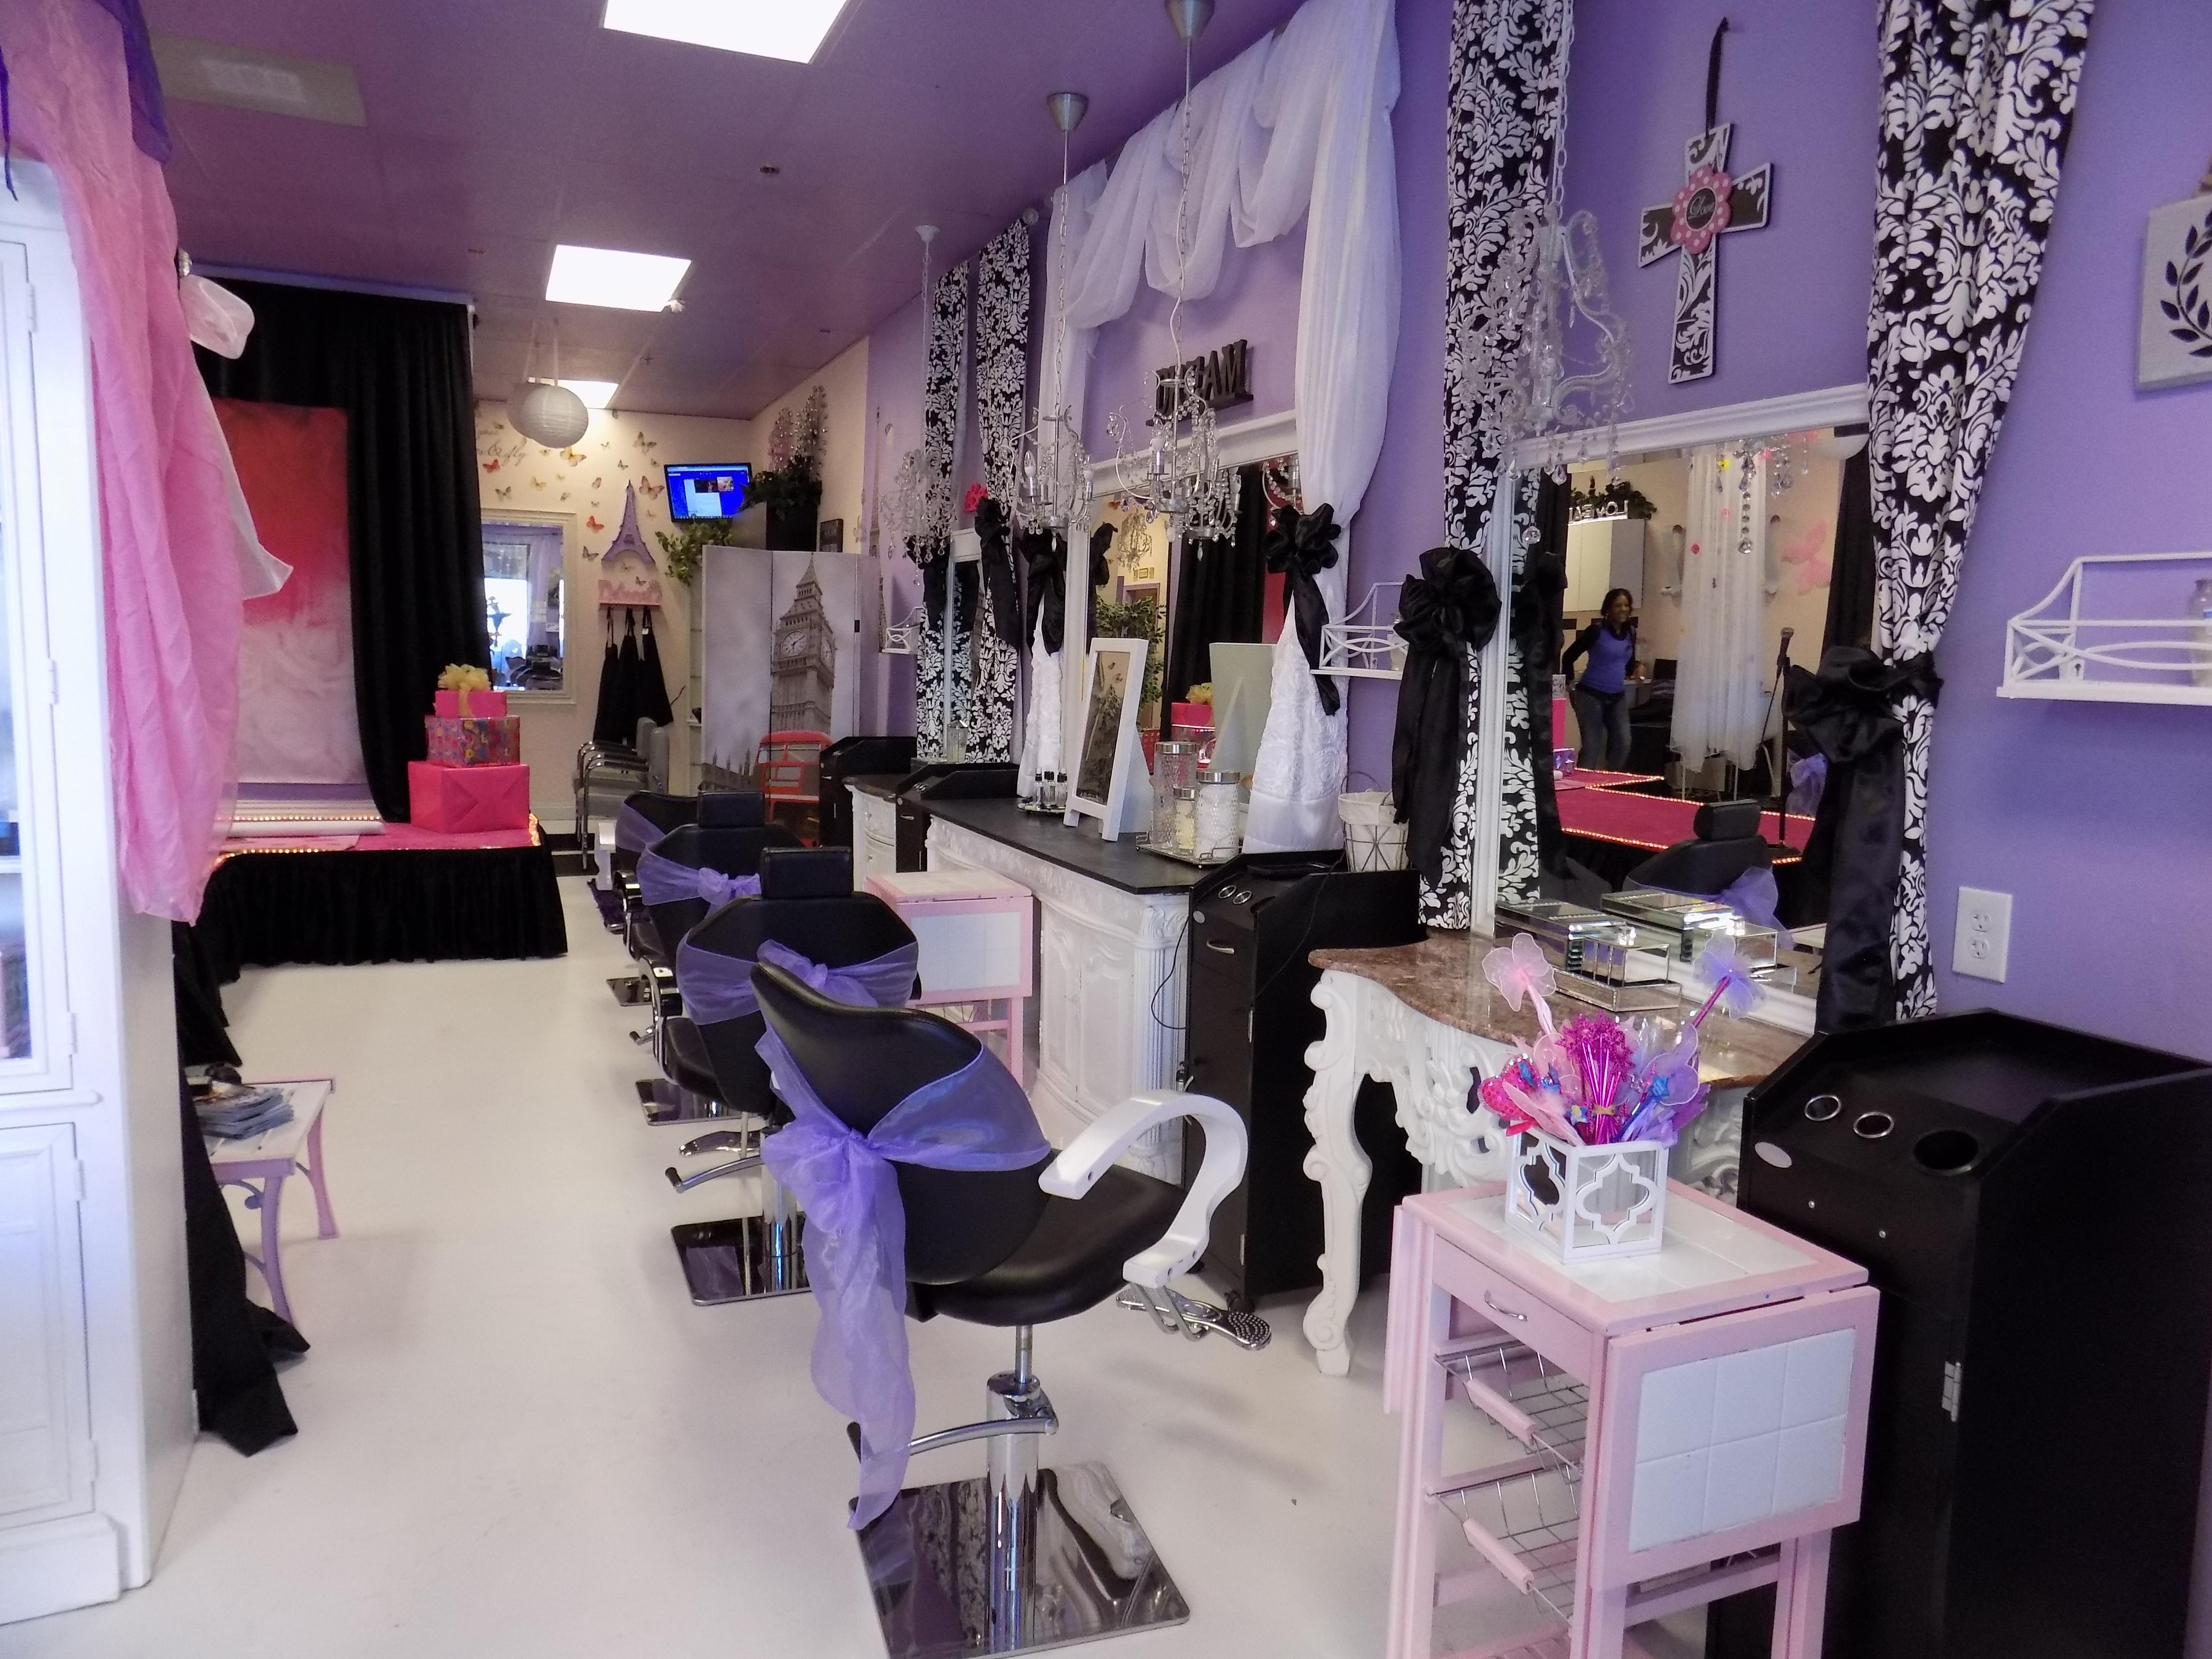 Dejlig lille Ladies Salon Bou, Murrieta California Ca-4382